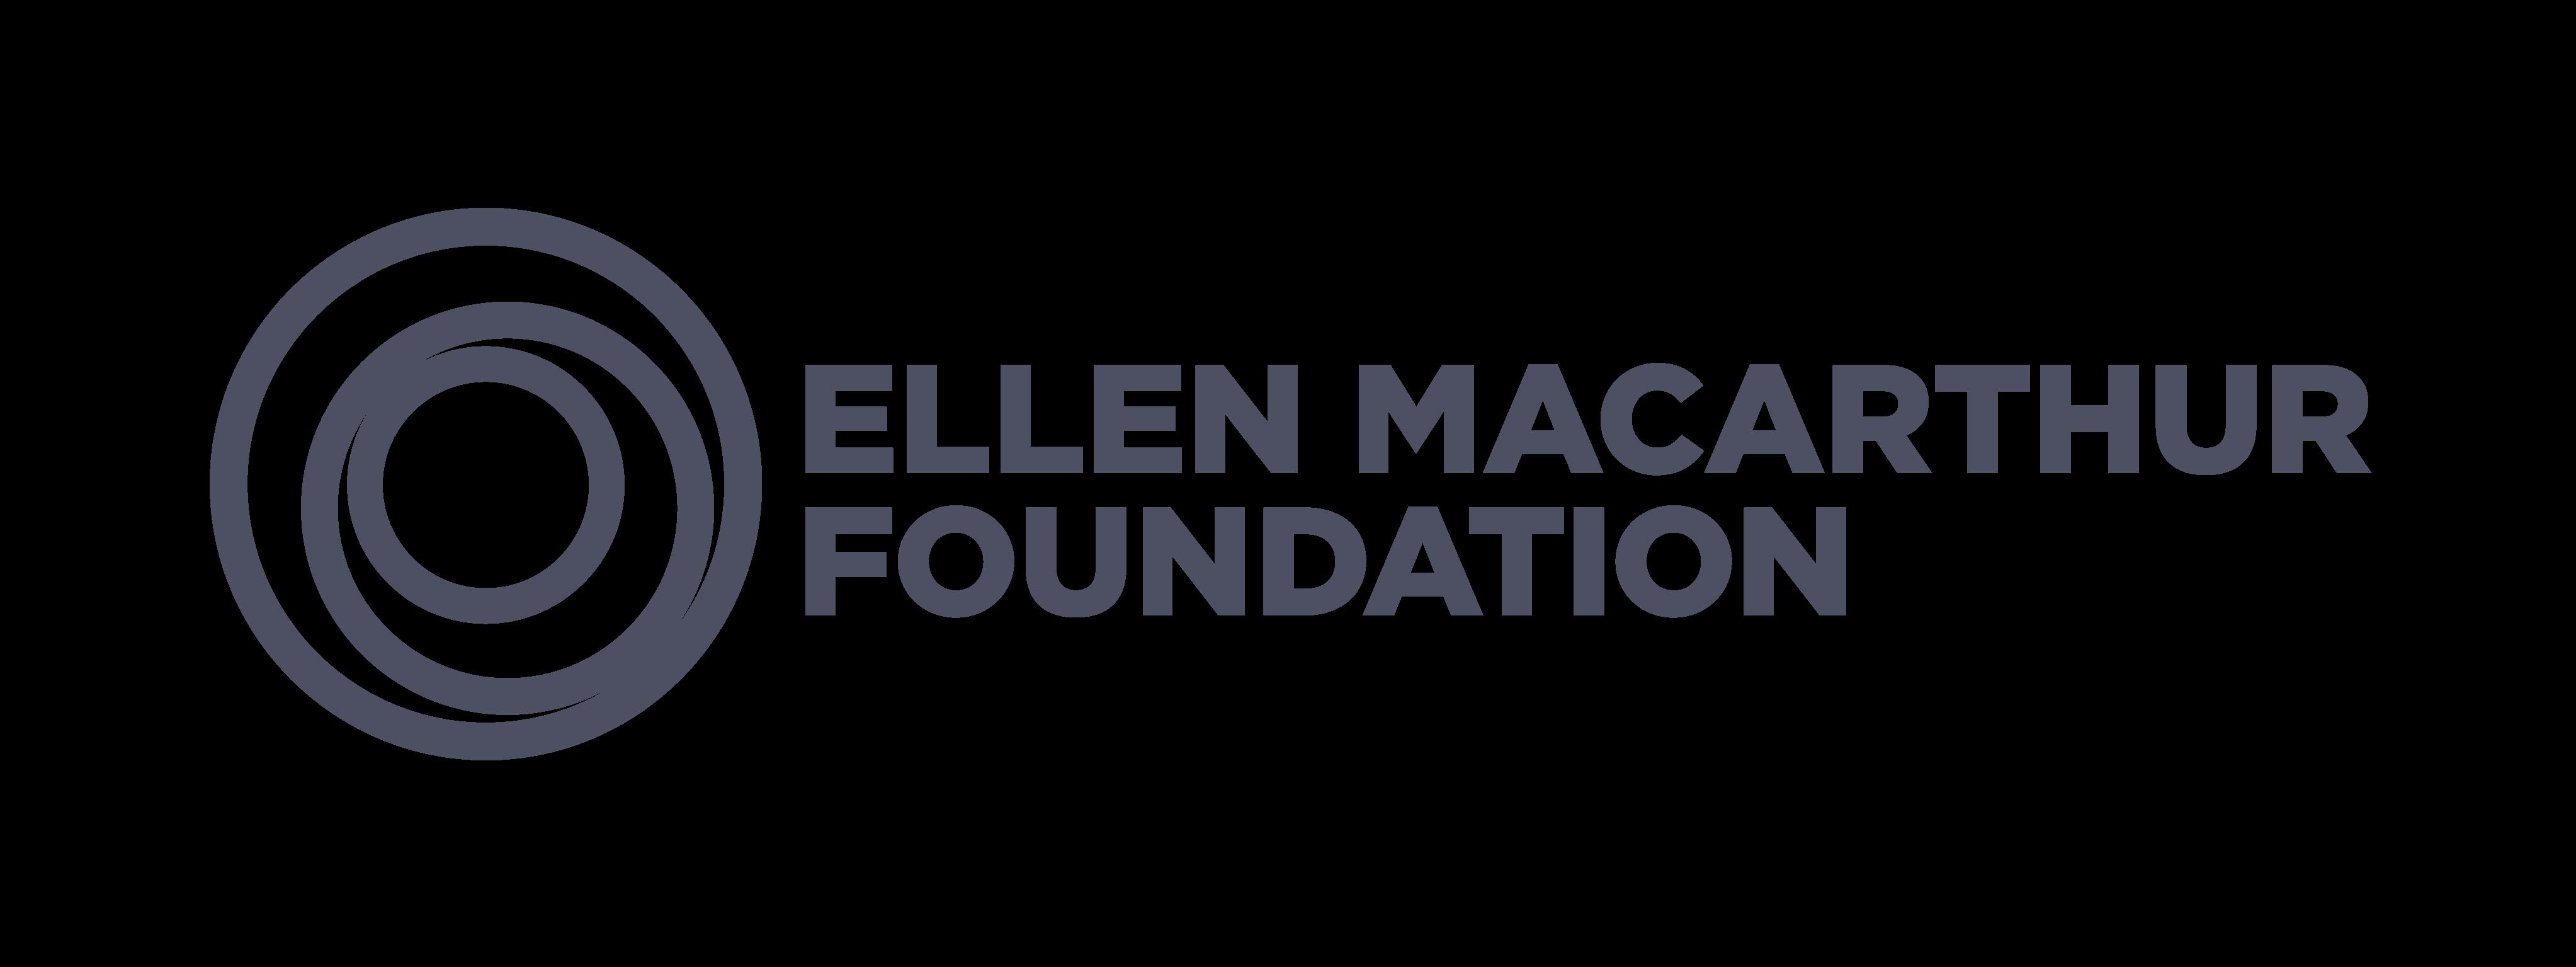 ellen-macarthur-foundation-logo